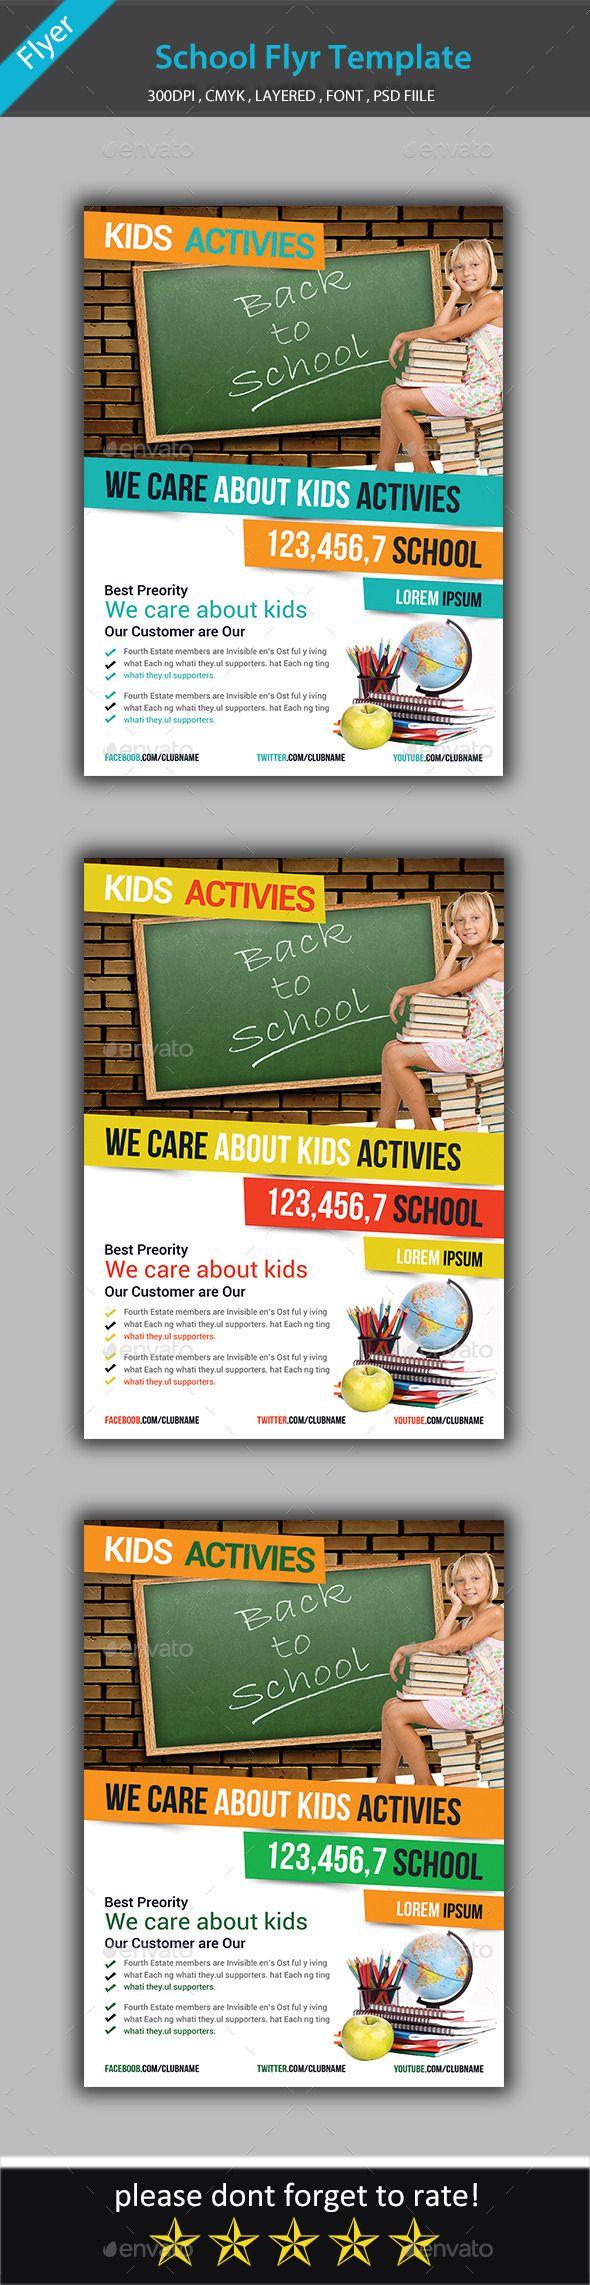 kids school flyer templates kid flyer template and flyers school education flyer template